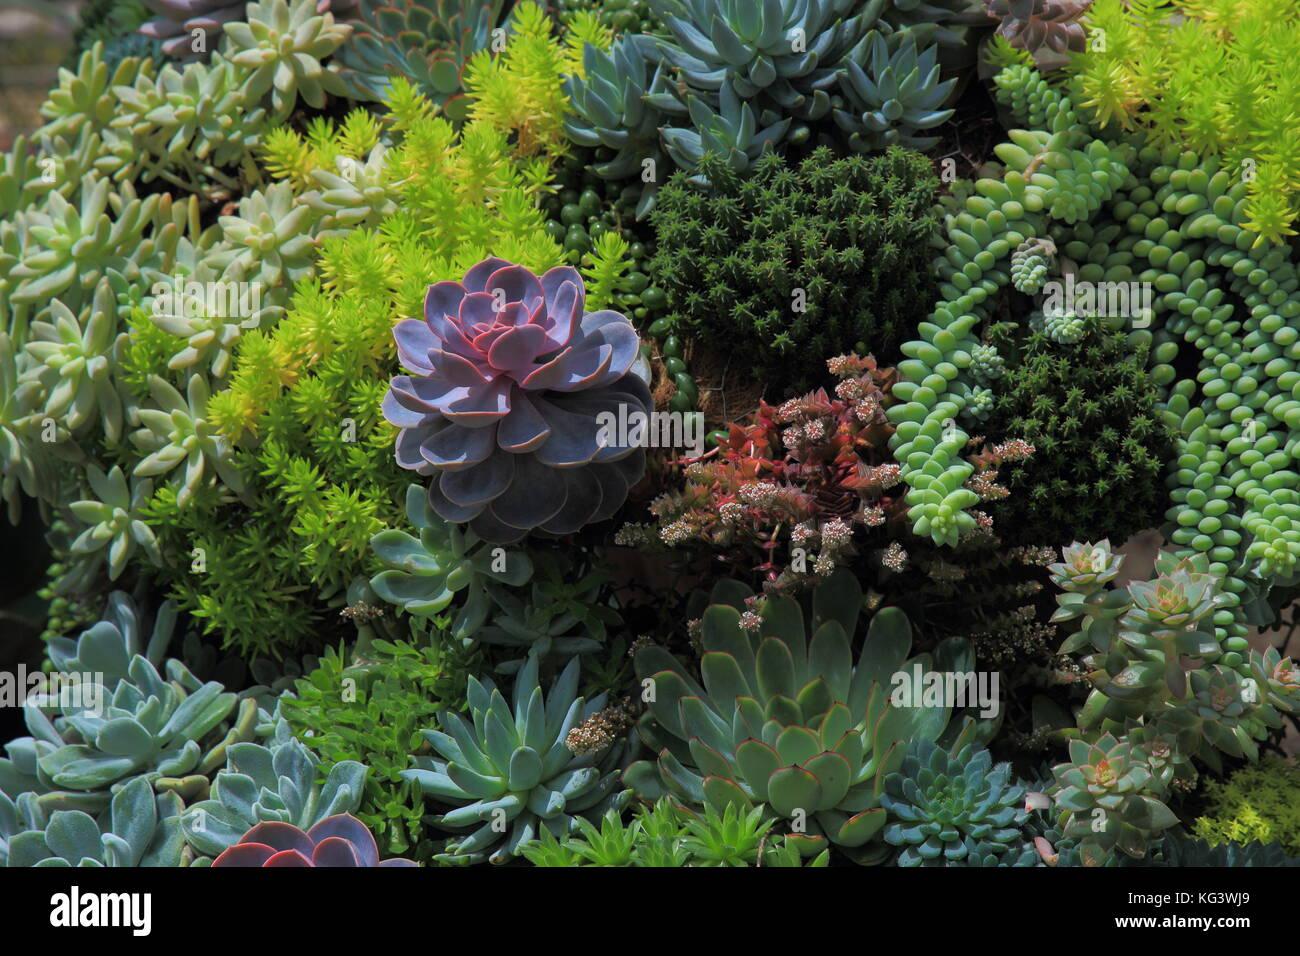 Miniature garden stockfotos miniature garden bilder alamy - Miniatur garten ...